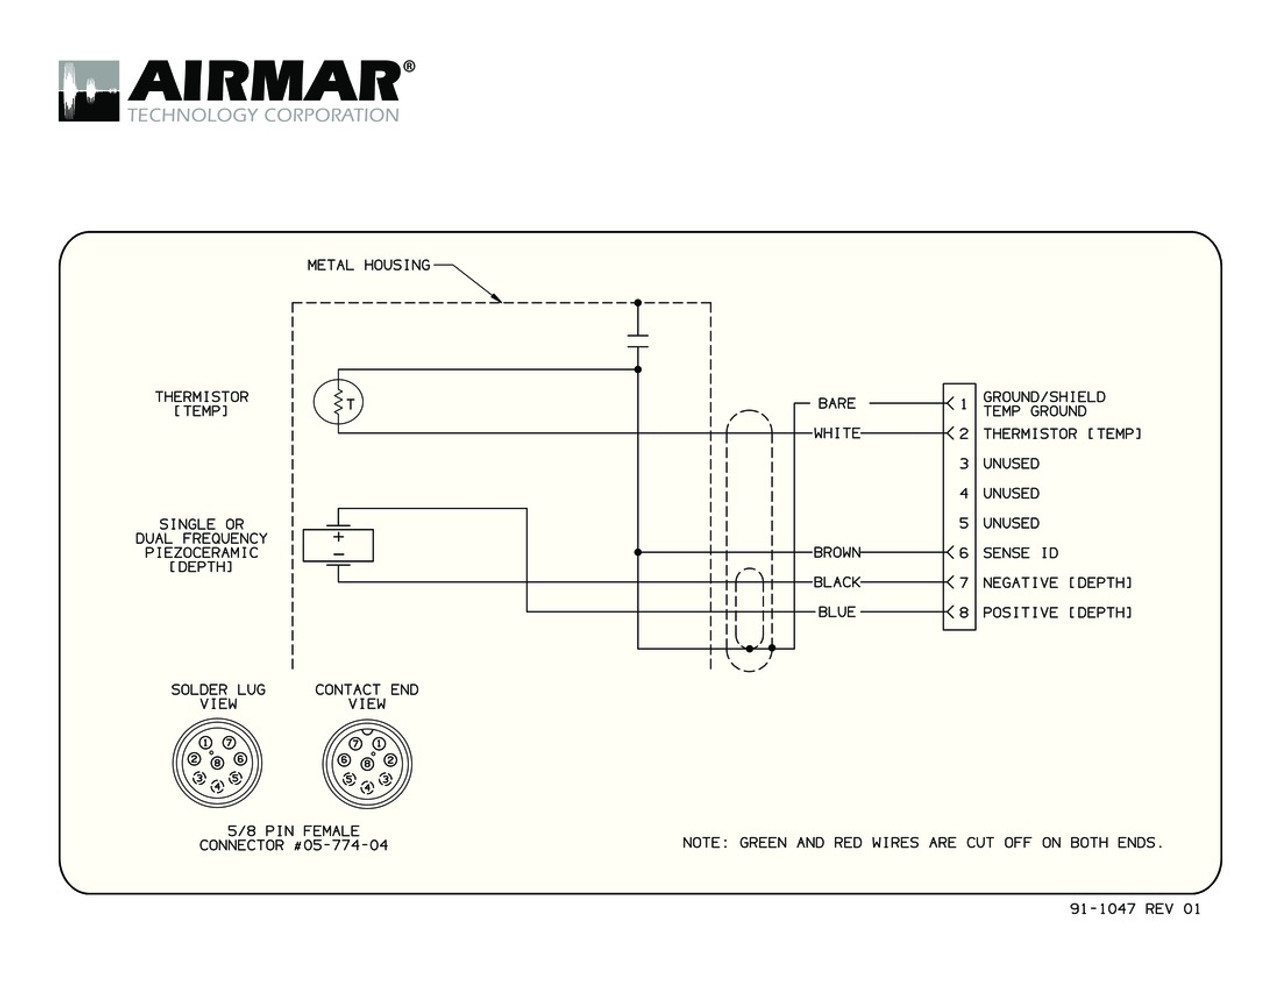 small resolution of garmin gps 441s wiring diagram wiring schematic diagram 192garmin 441s wiring diagram wiring schematic diagram 192